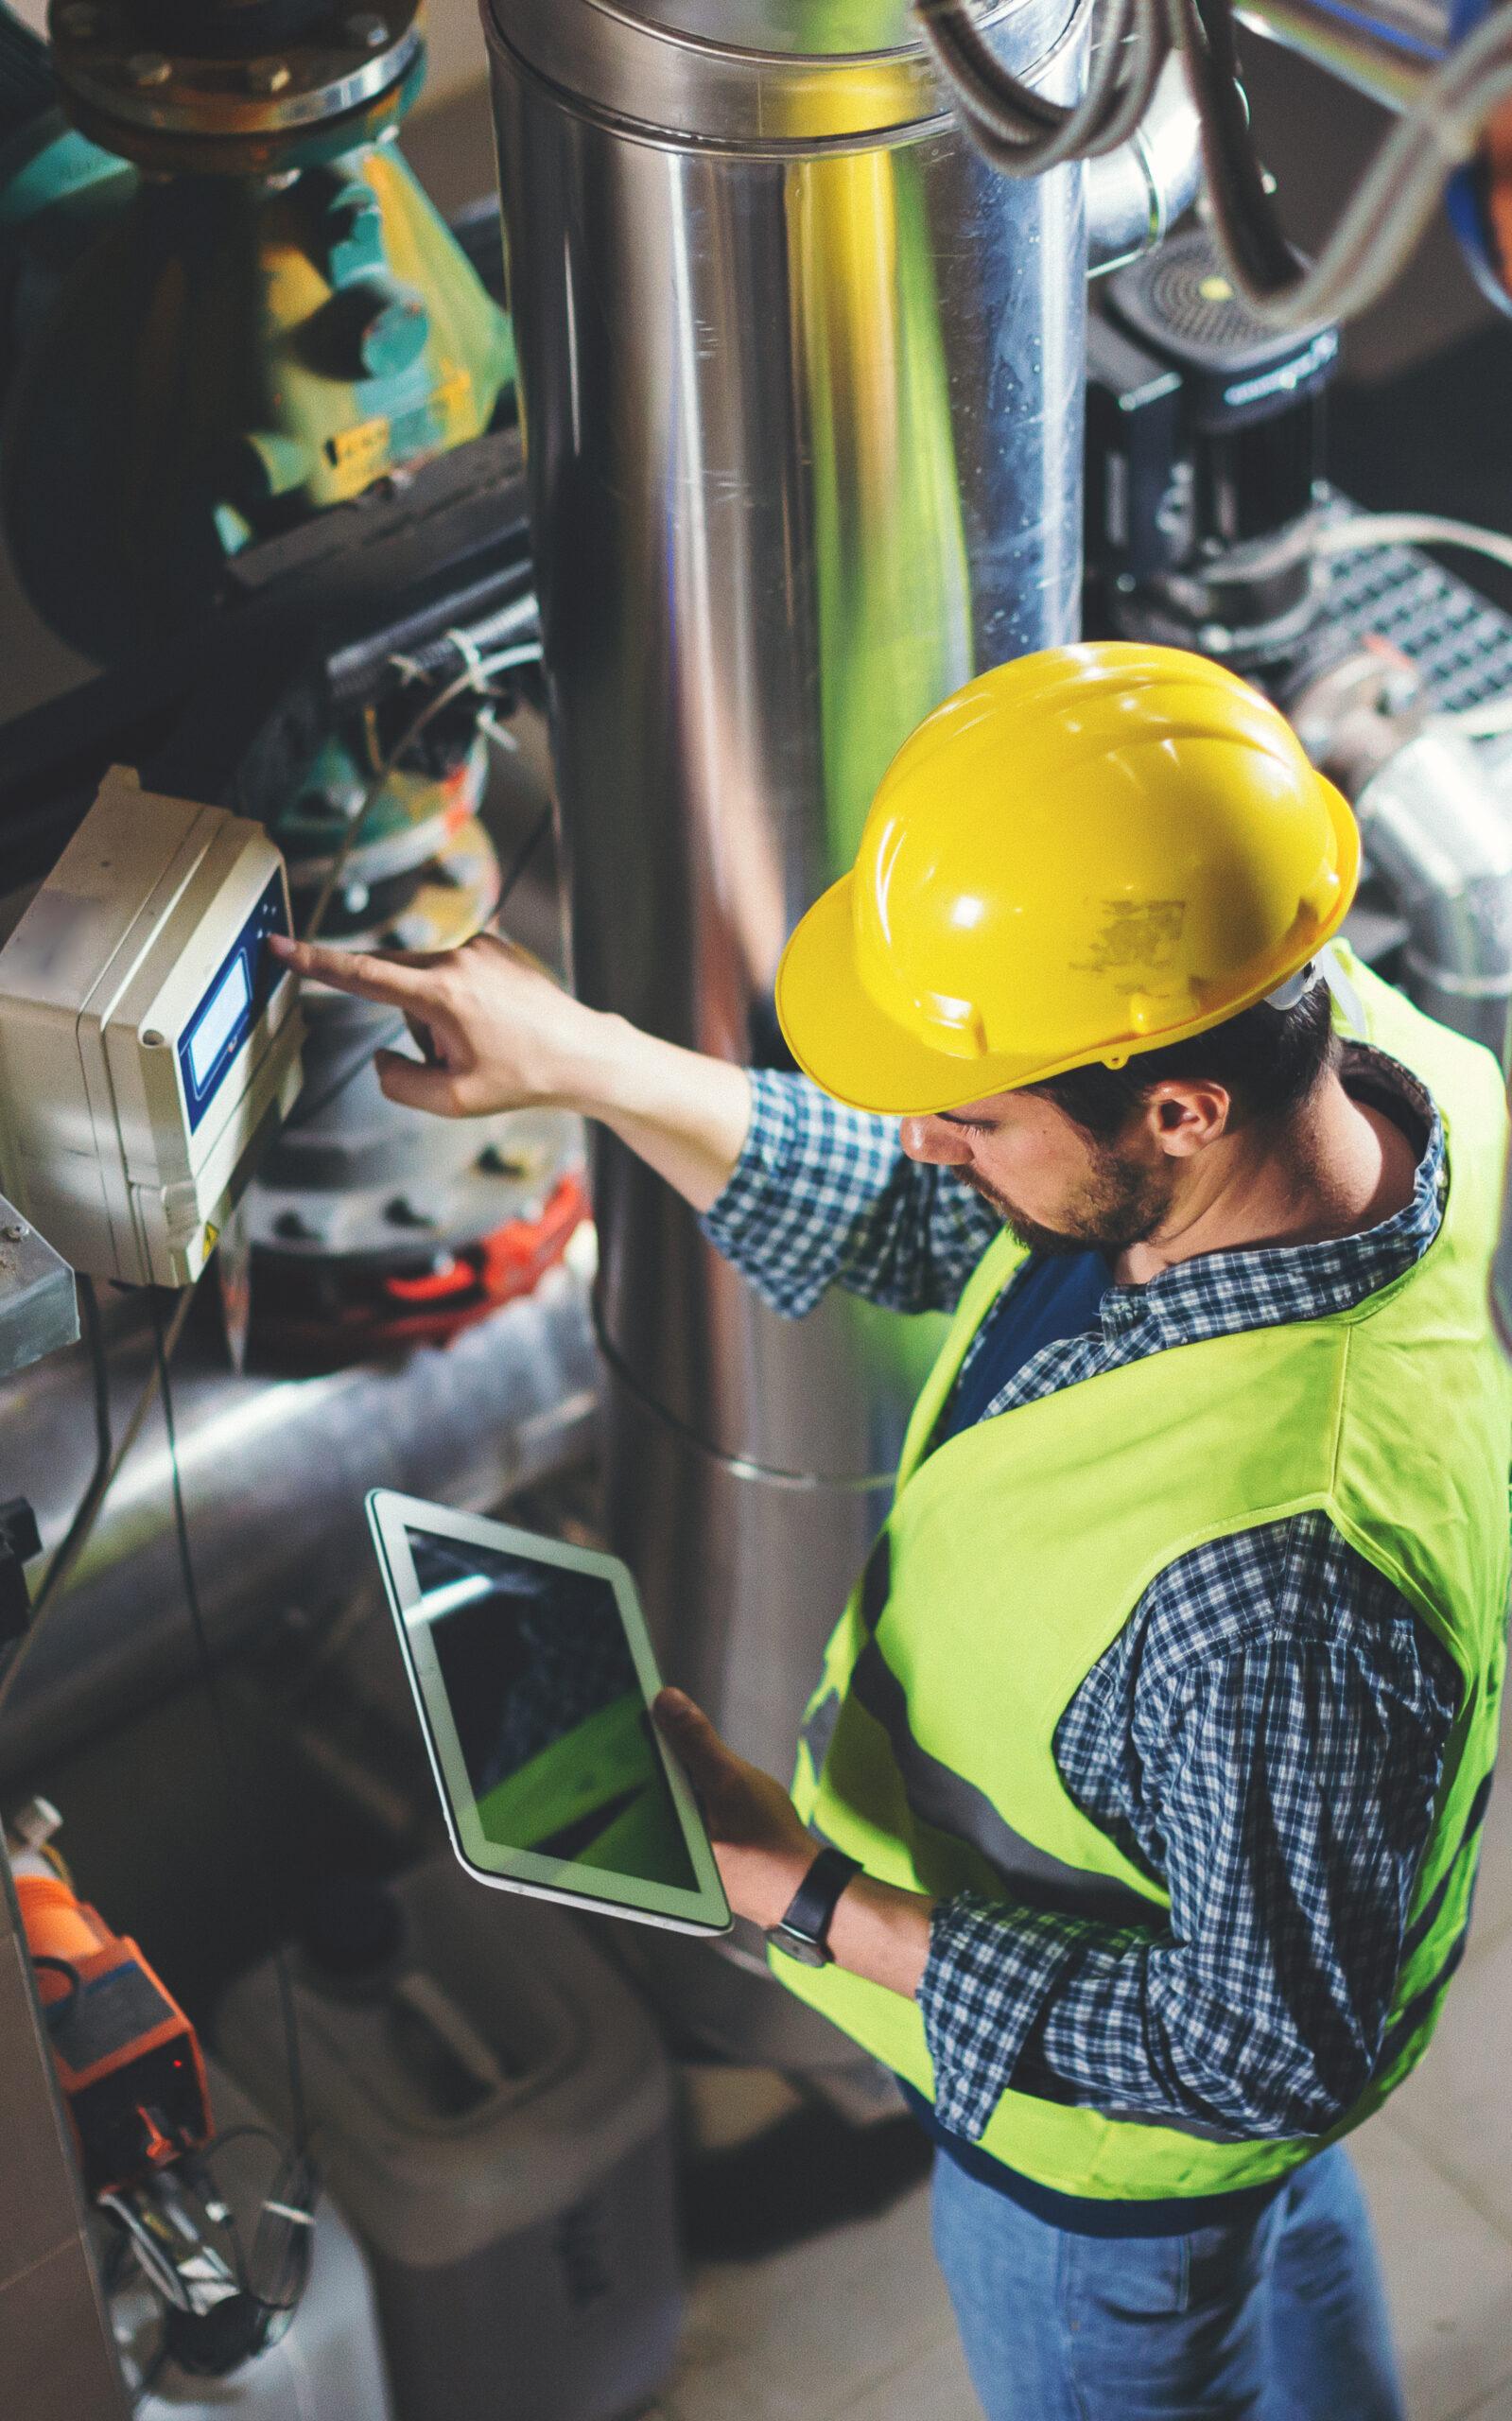 Inspector checking equipment to establish asset reliability